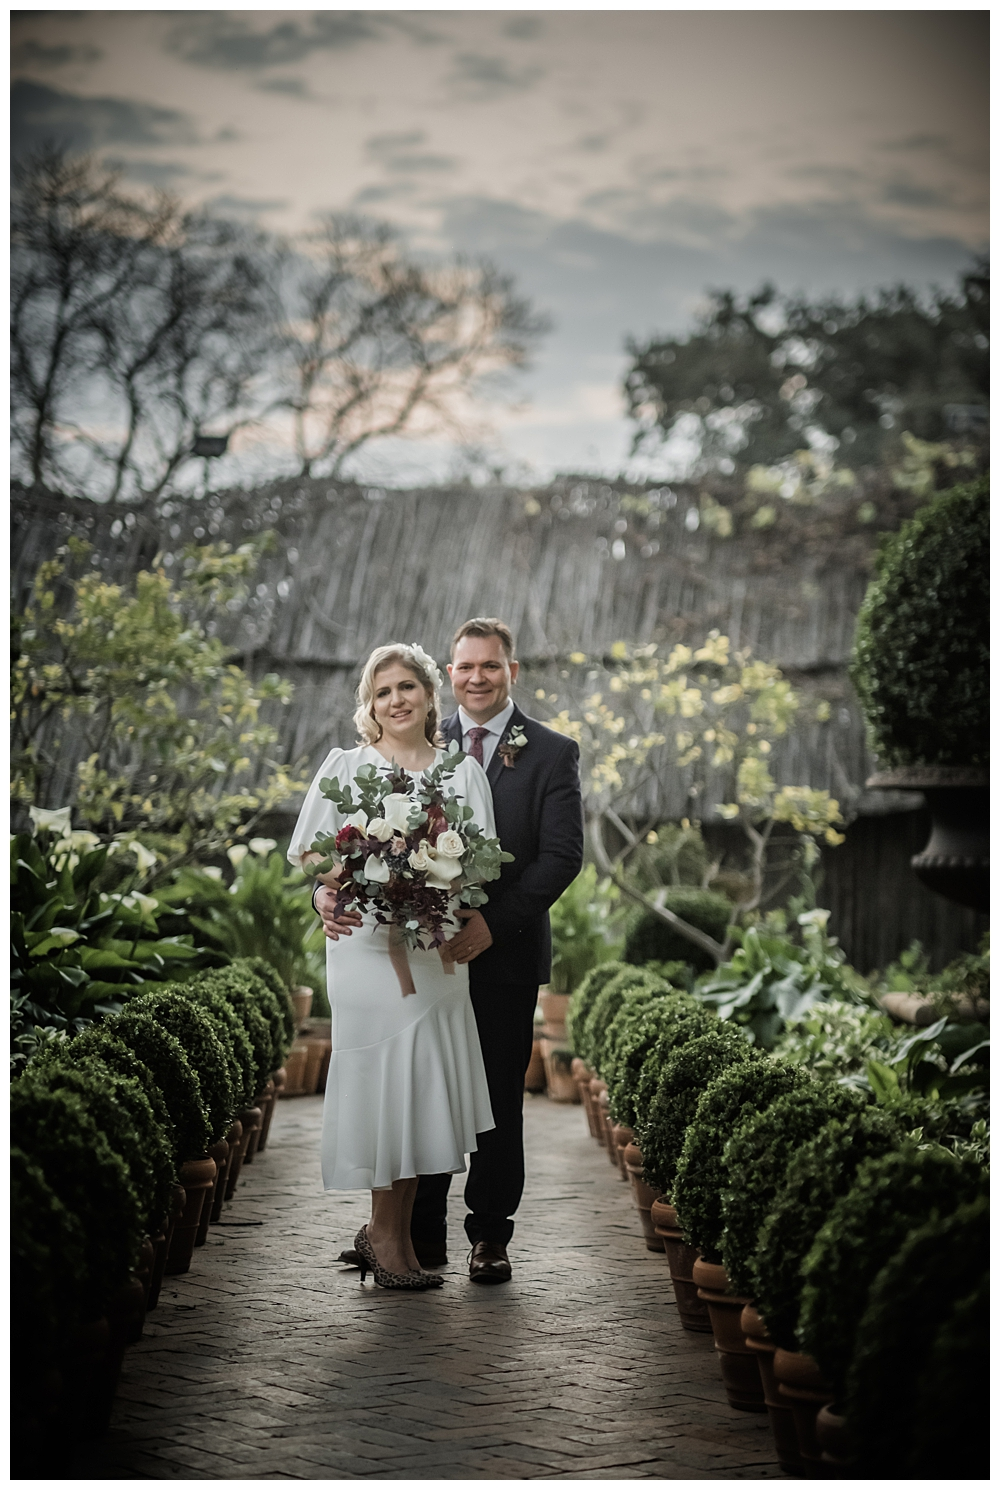 Best_Wedding_Photographer_AlexanderSmith_2321.jpg